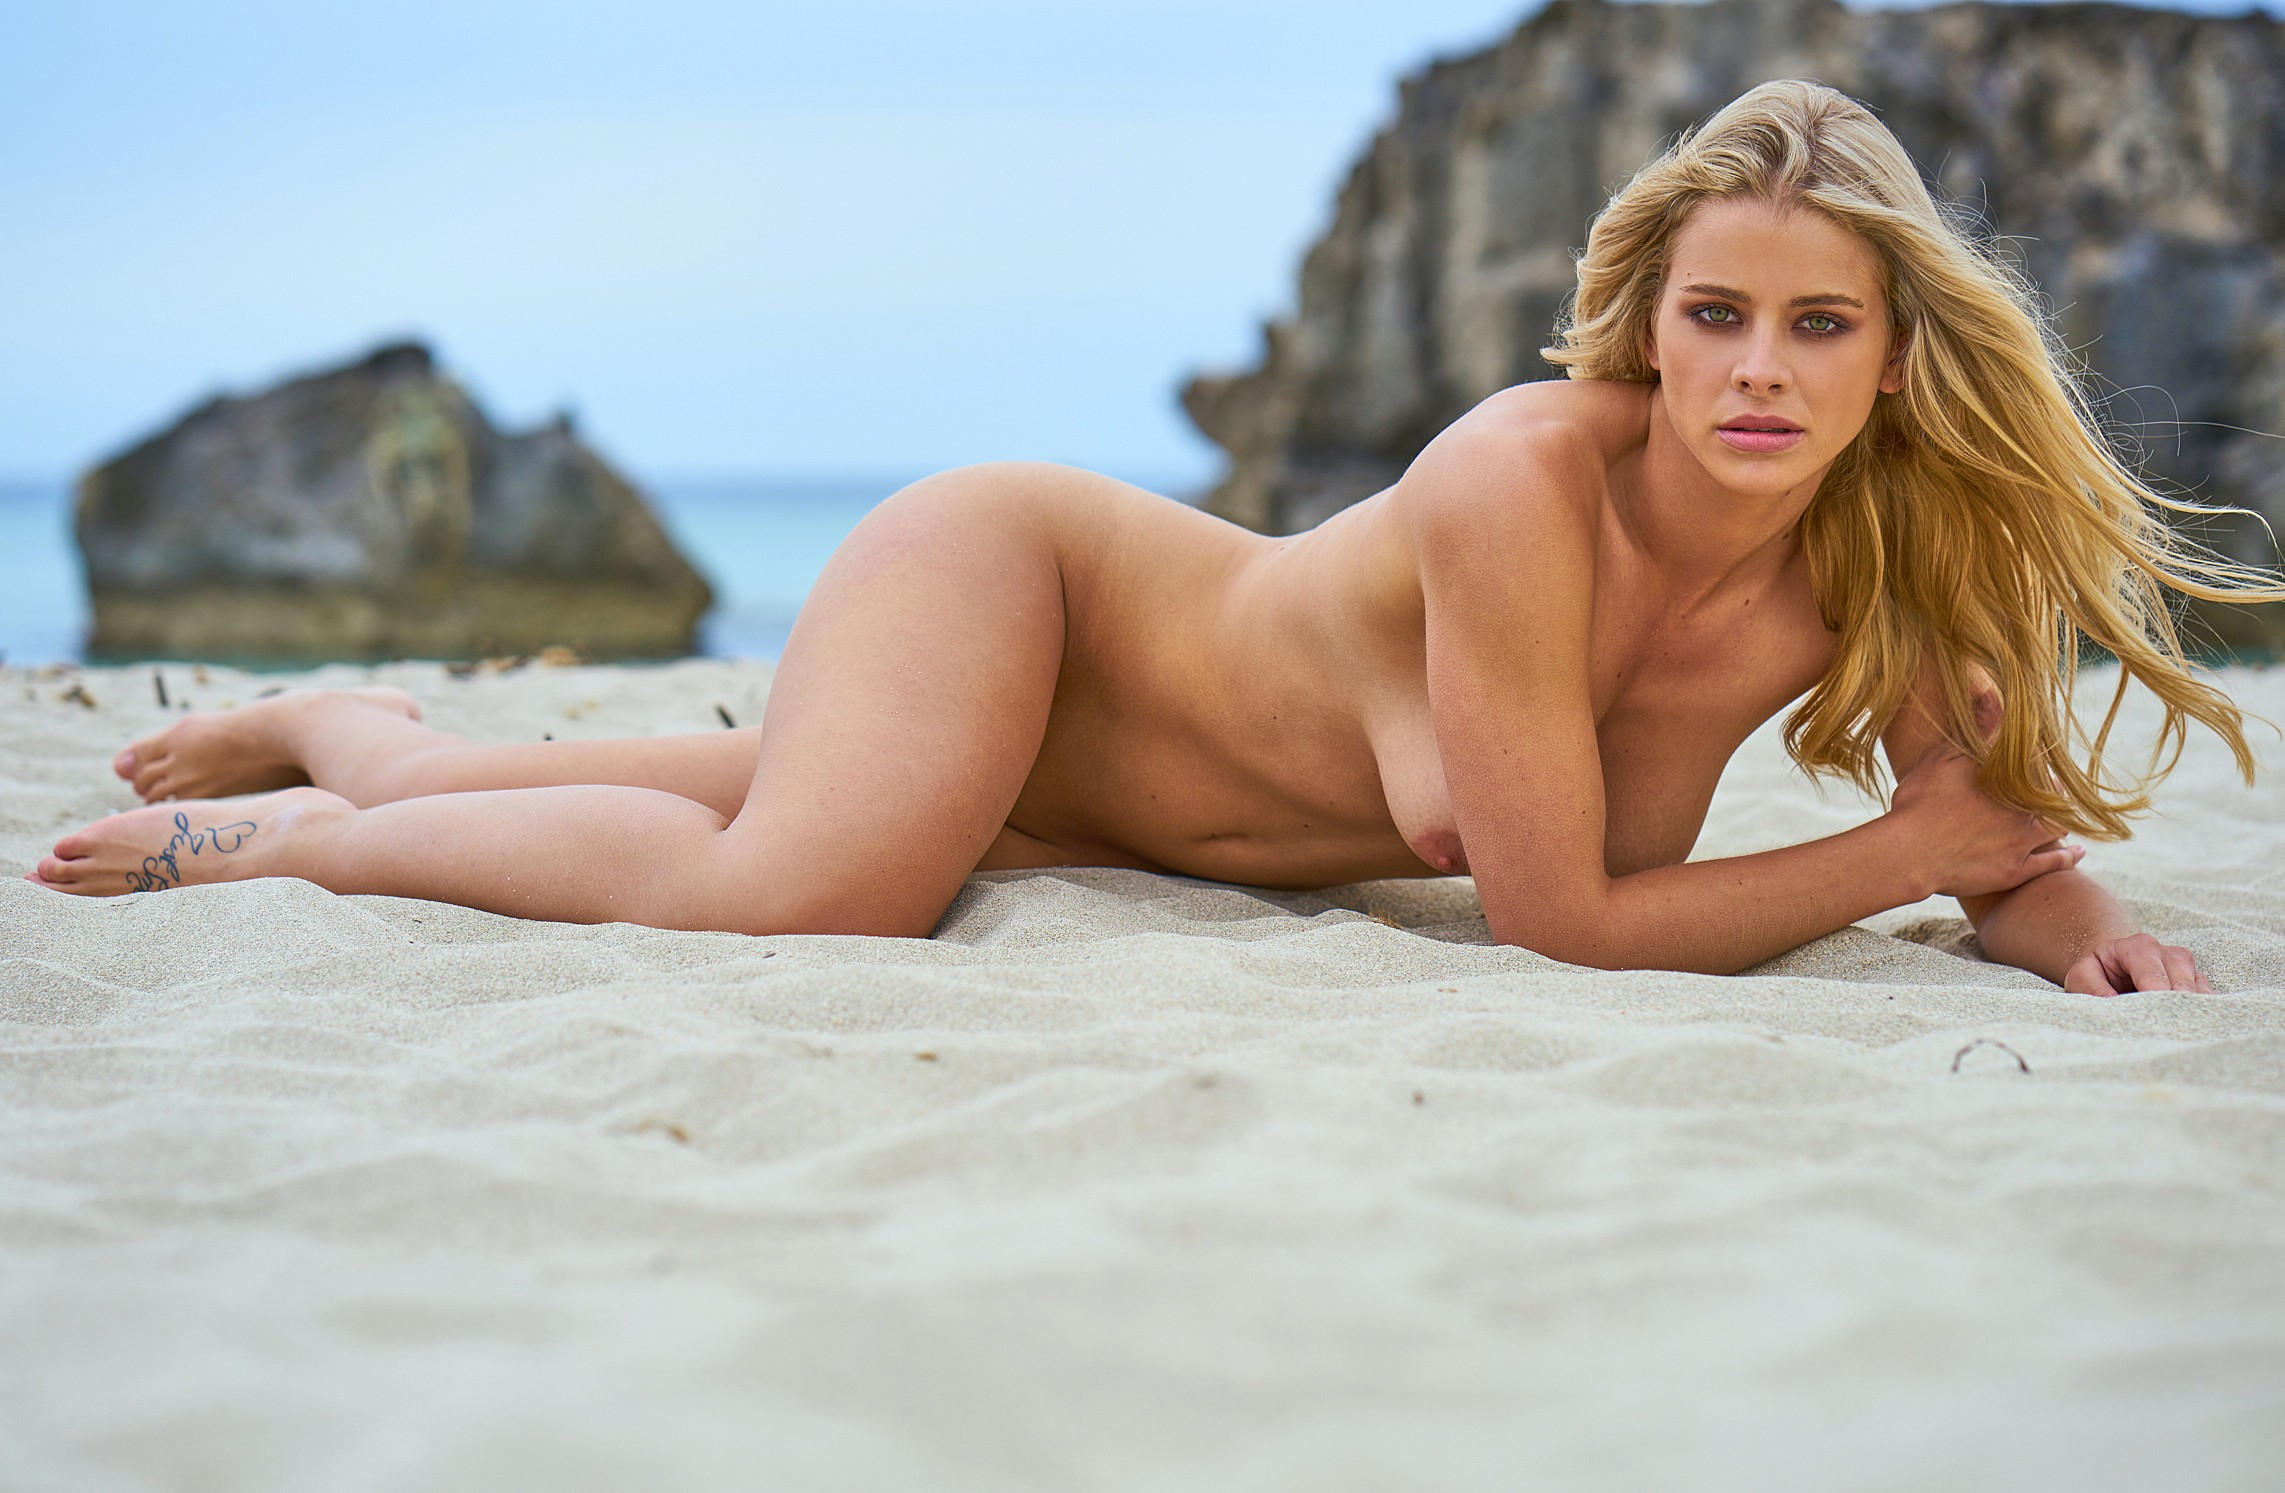 Saskia reeves nude porn pics